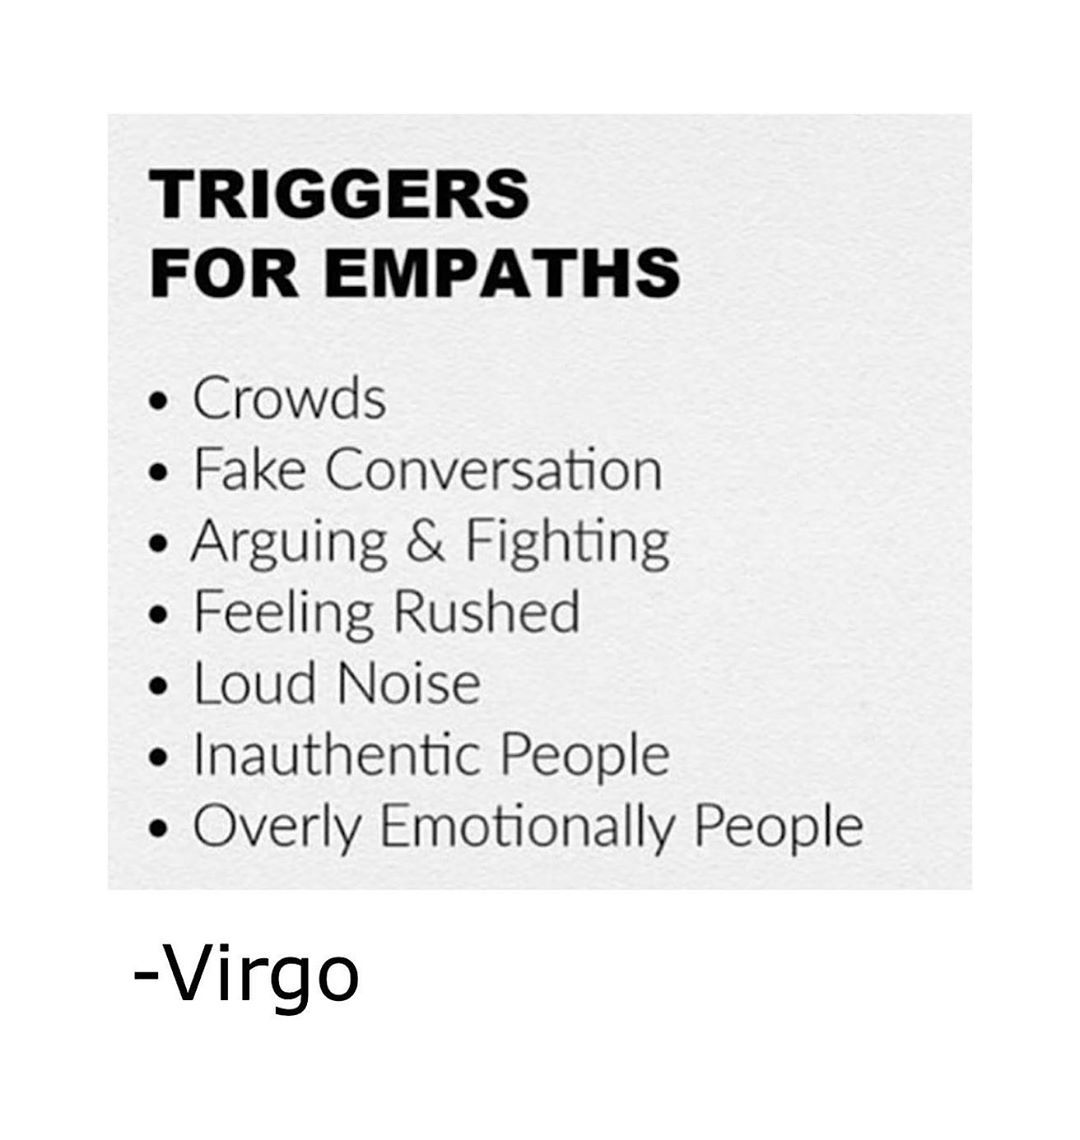 Virgoexperience On Instagram Virgoexperience Virgo